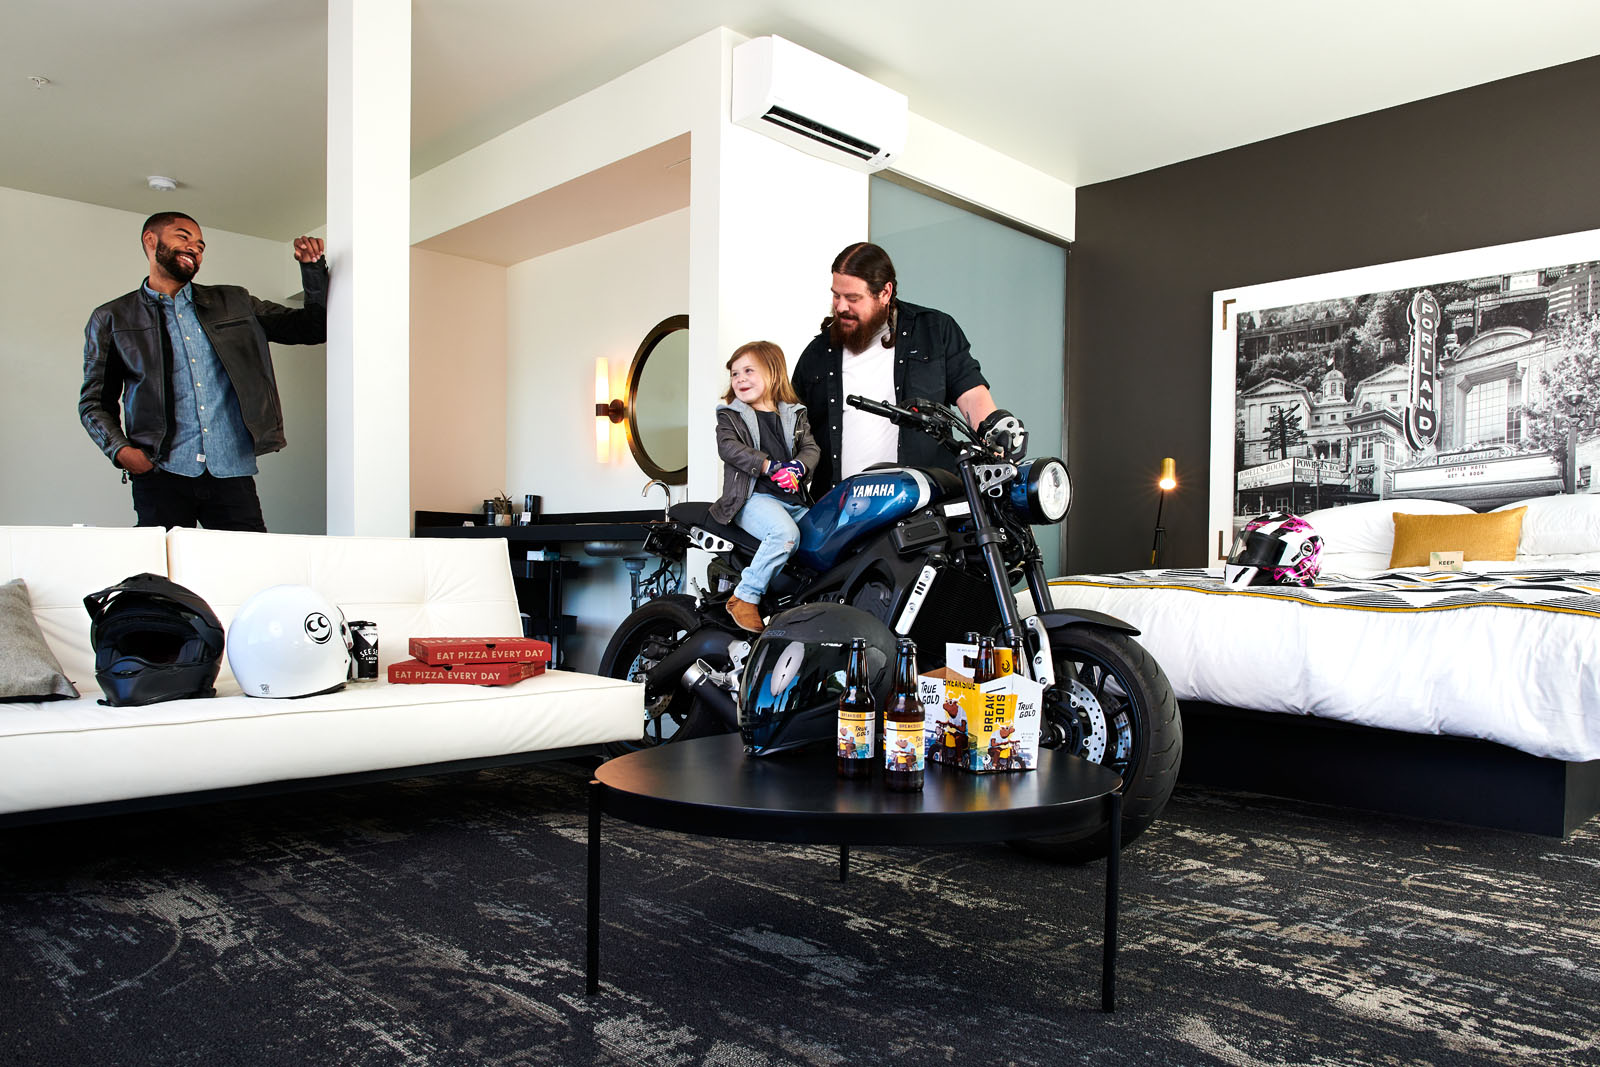 Dina Avila photography for Jupiter Hotel NEXT moto shot